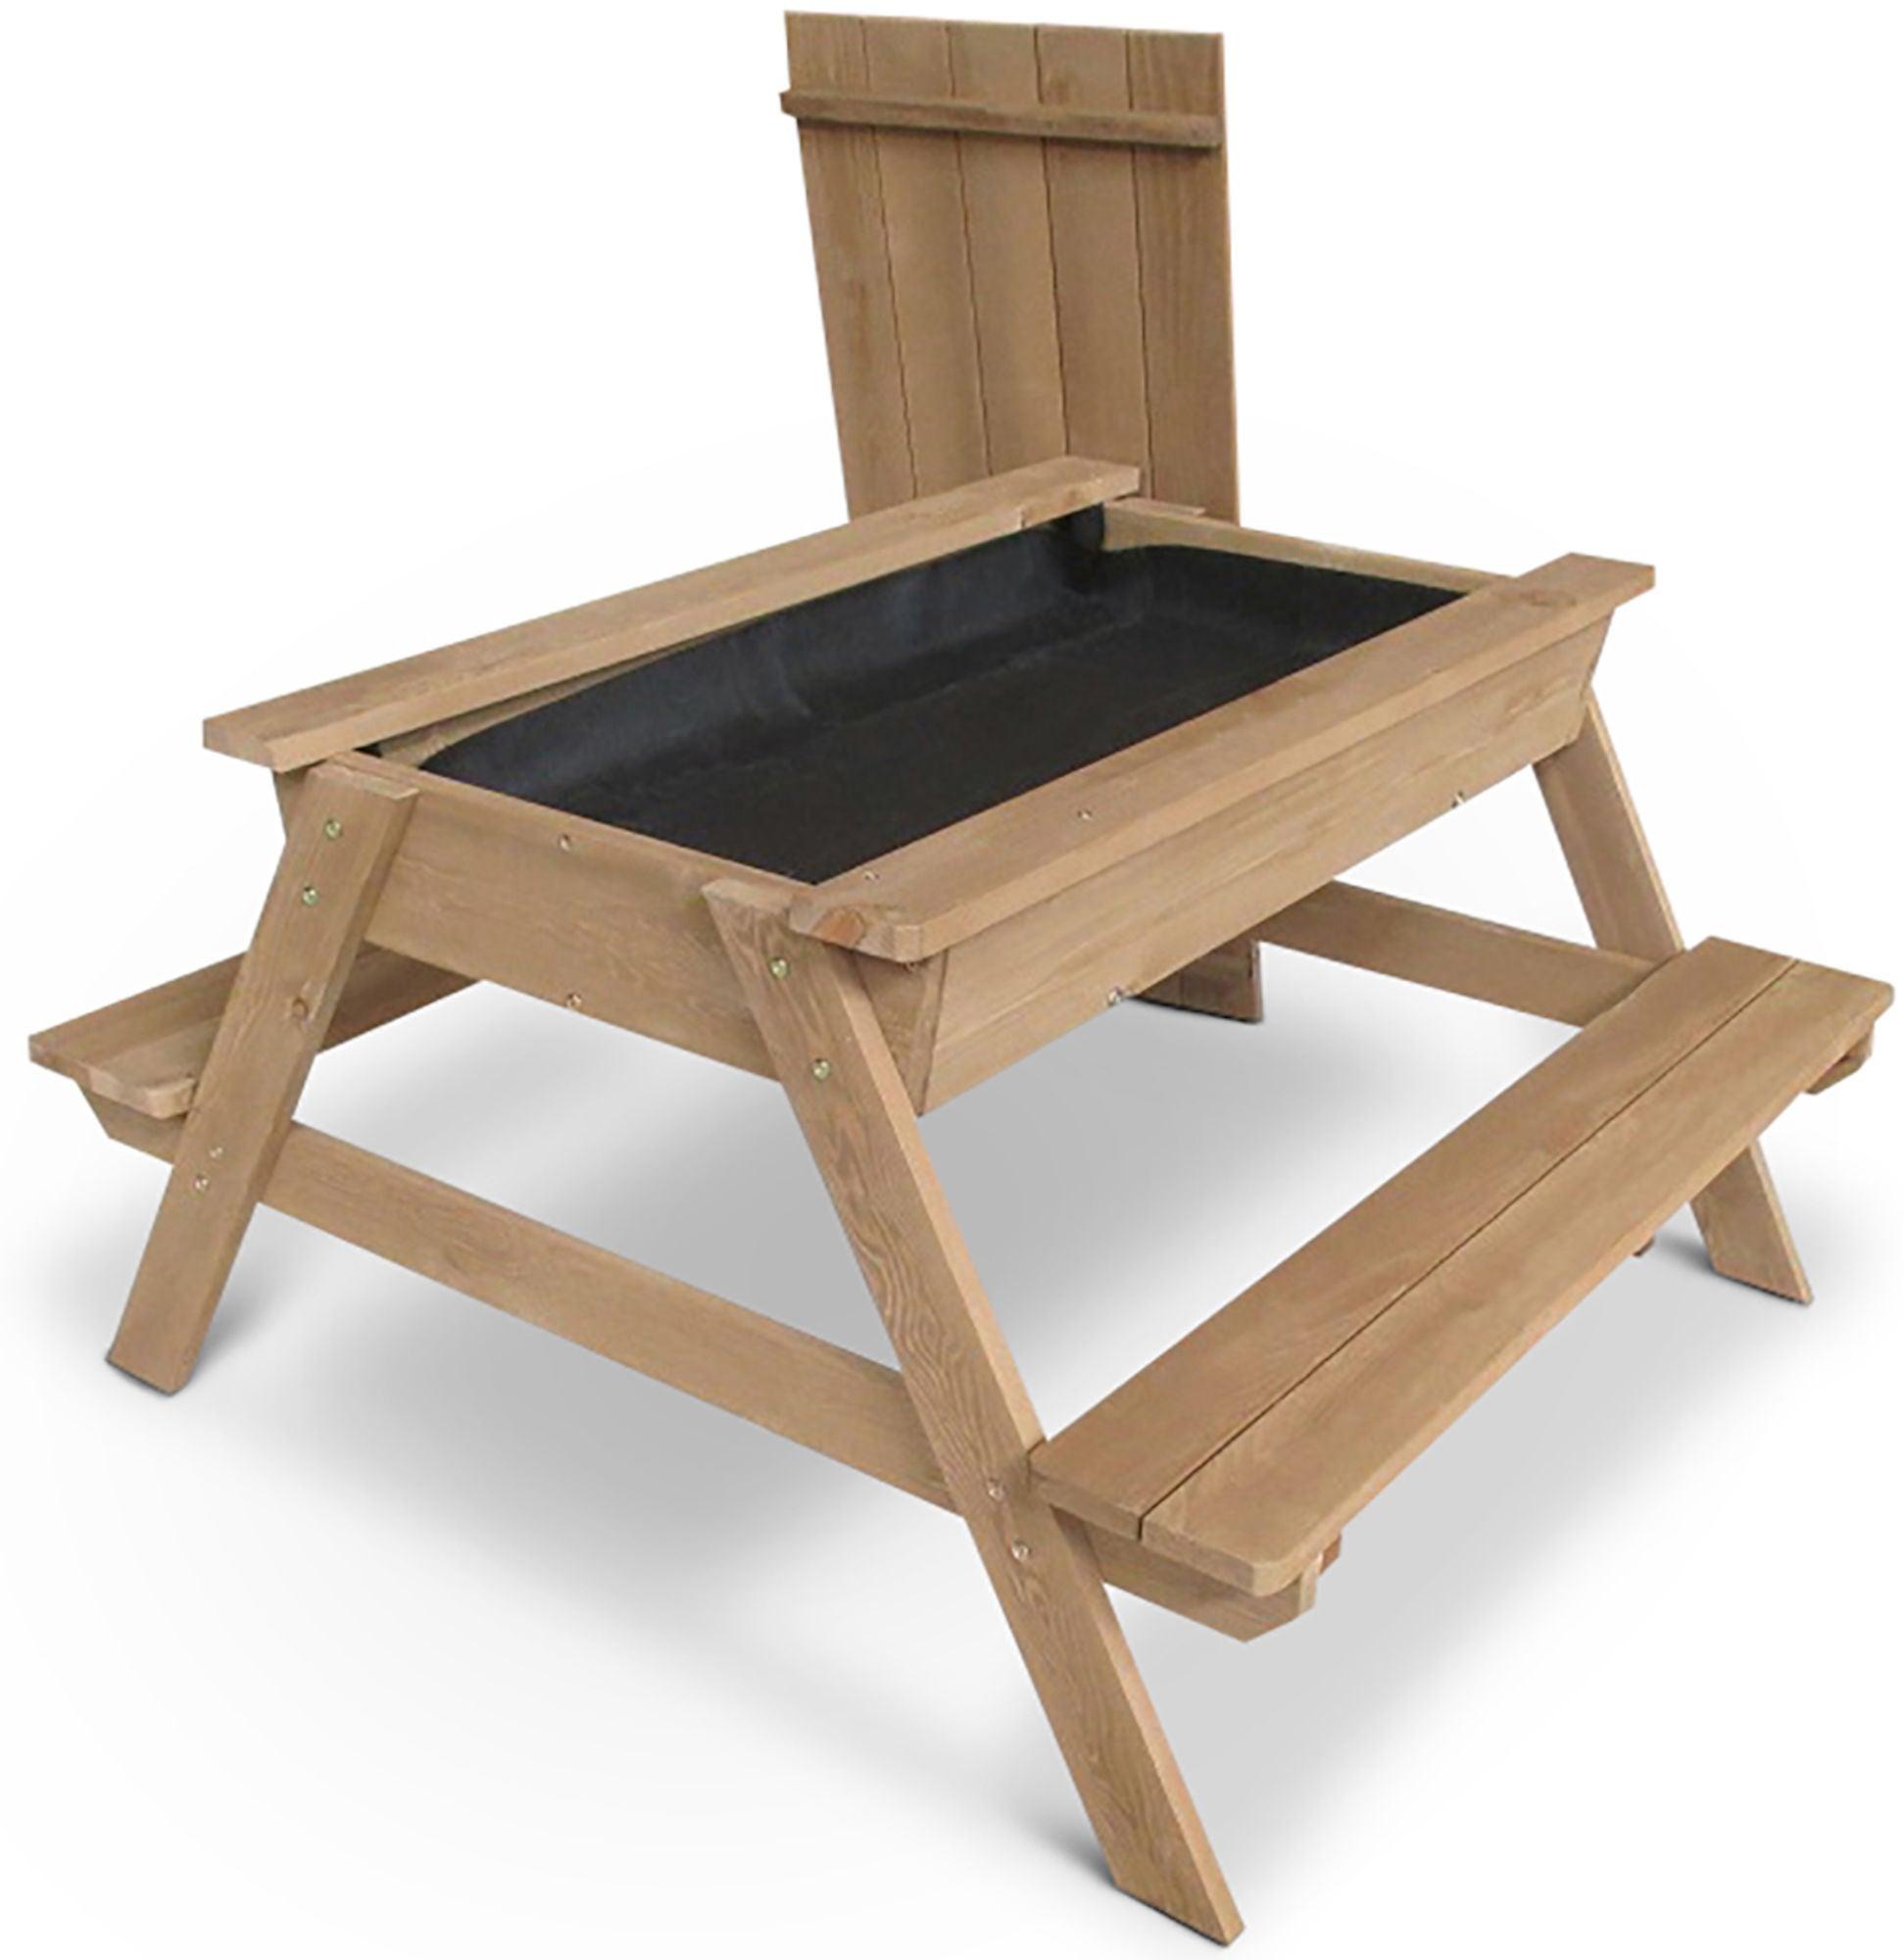 Woodlii Piknikbord med Sandkasse, Brun